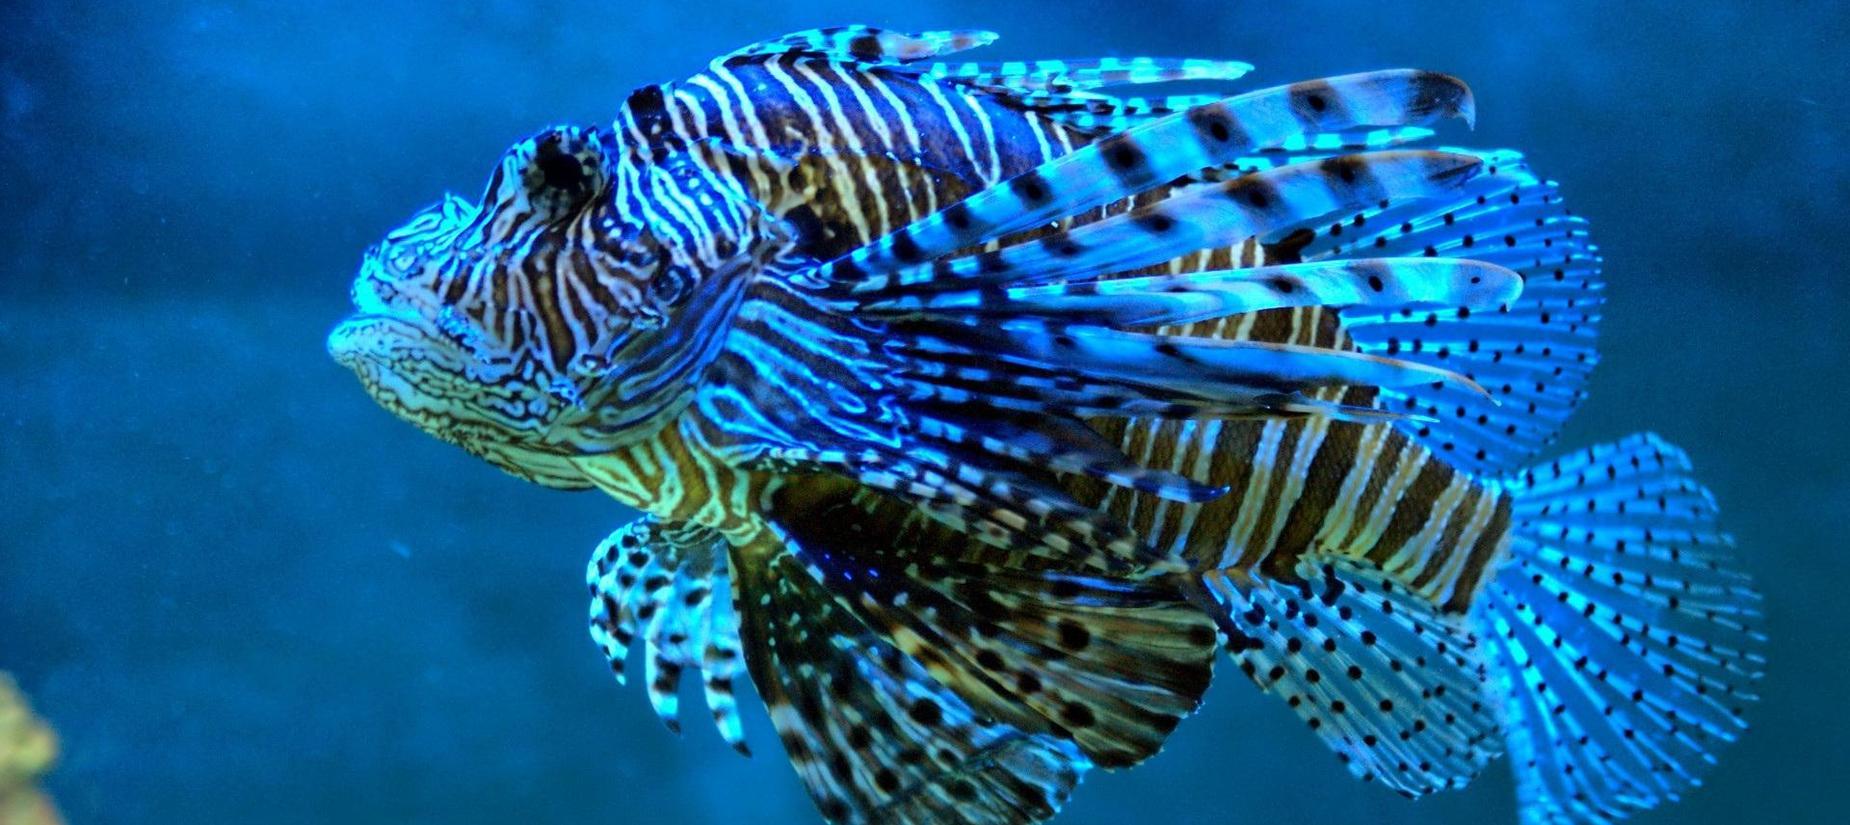 Blue ocean coral fish